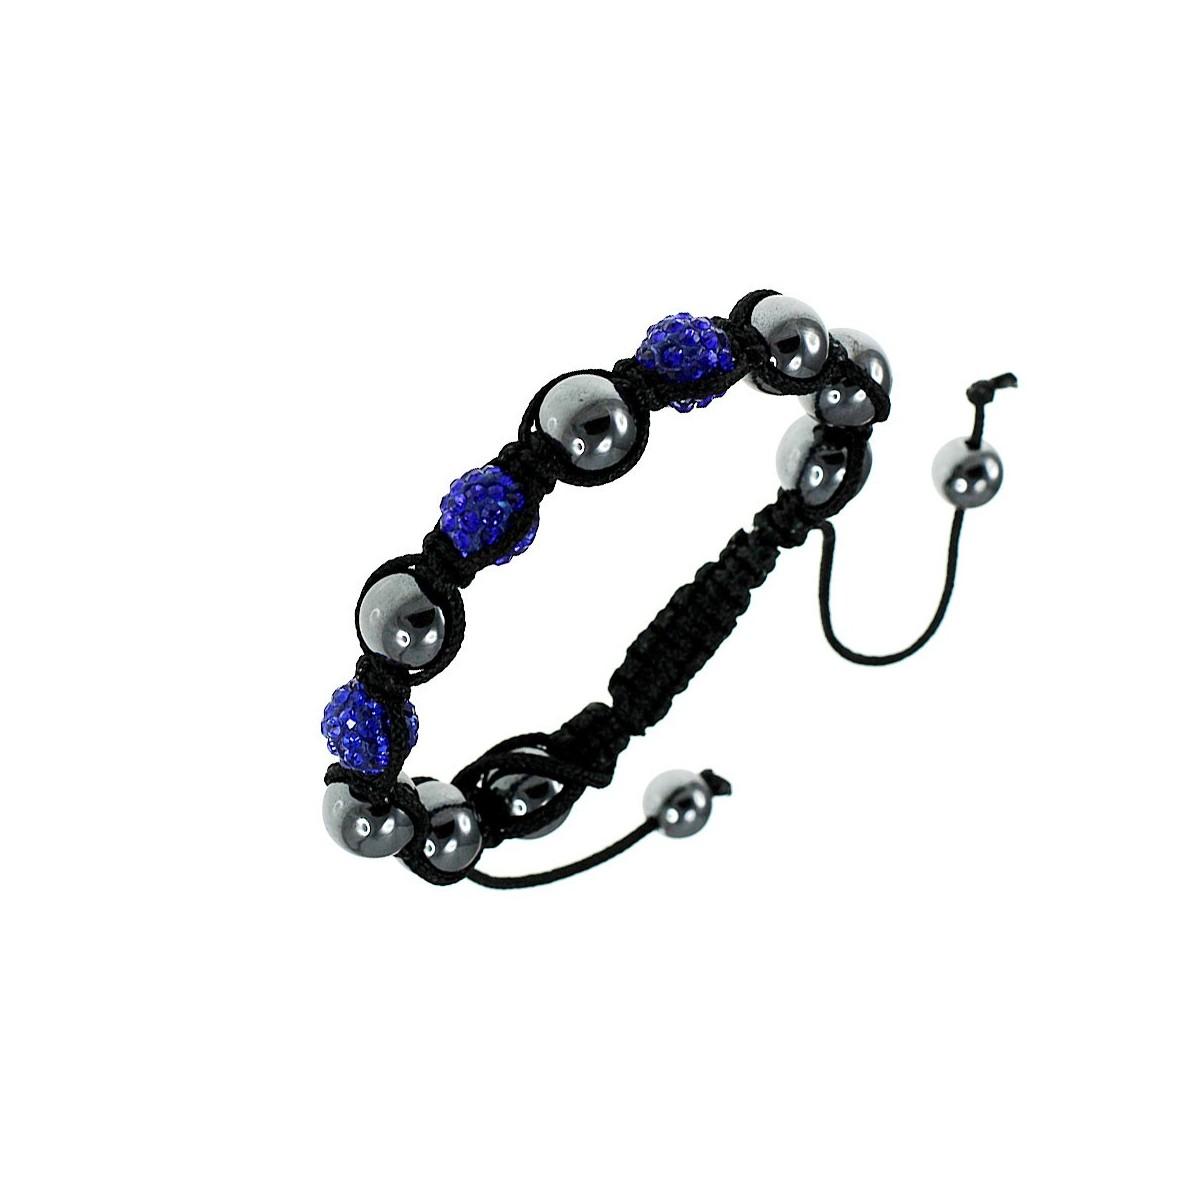 Bracelet shamballa en cristal de bohème bleu